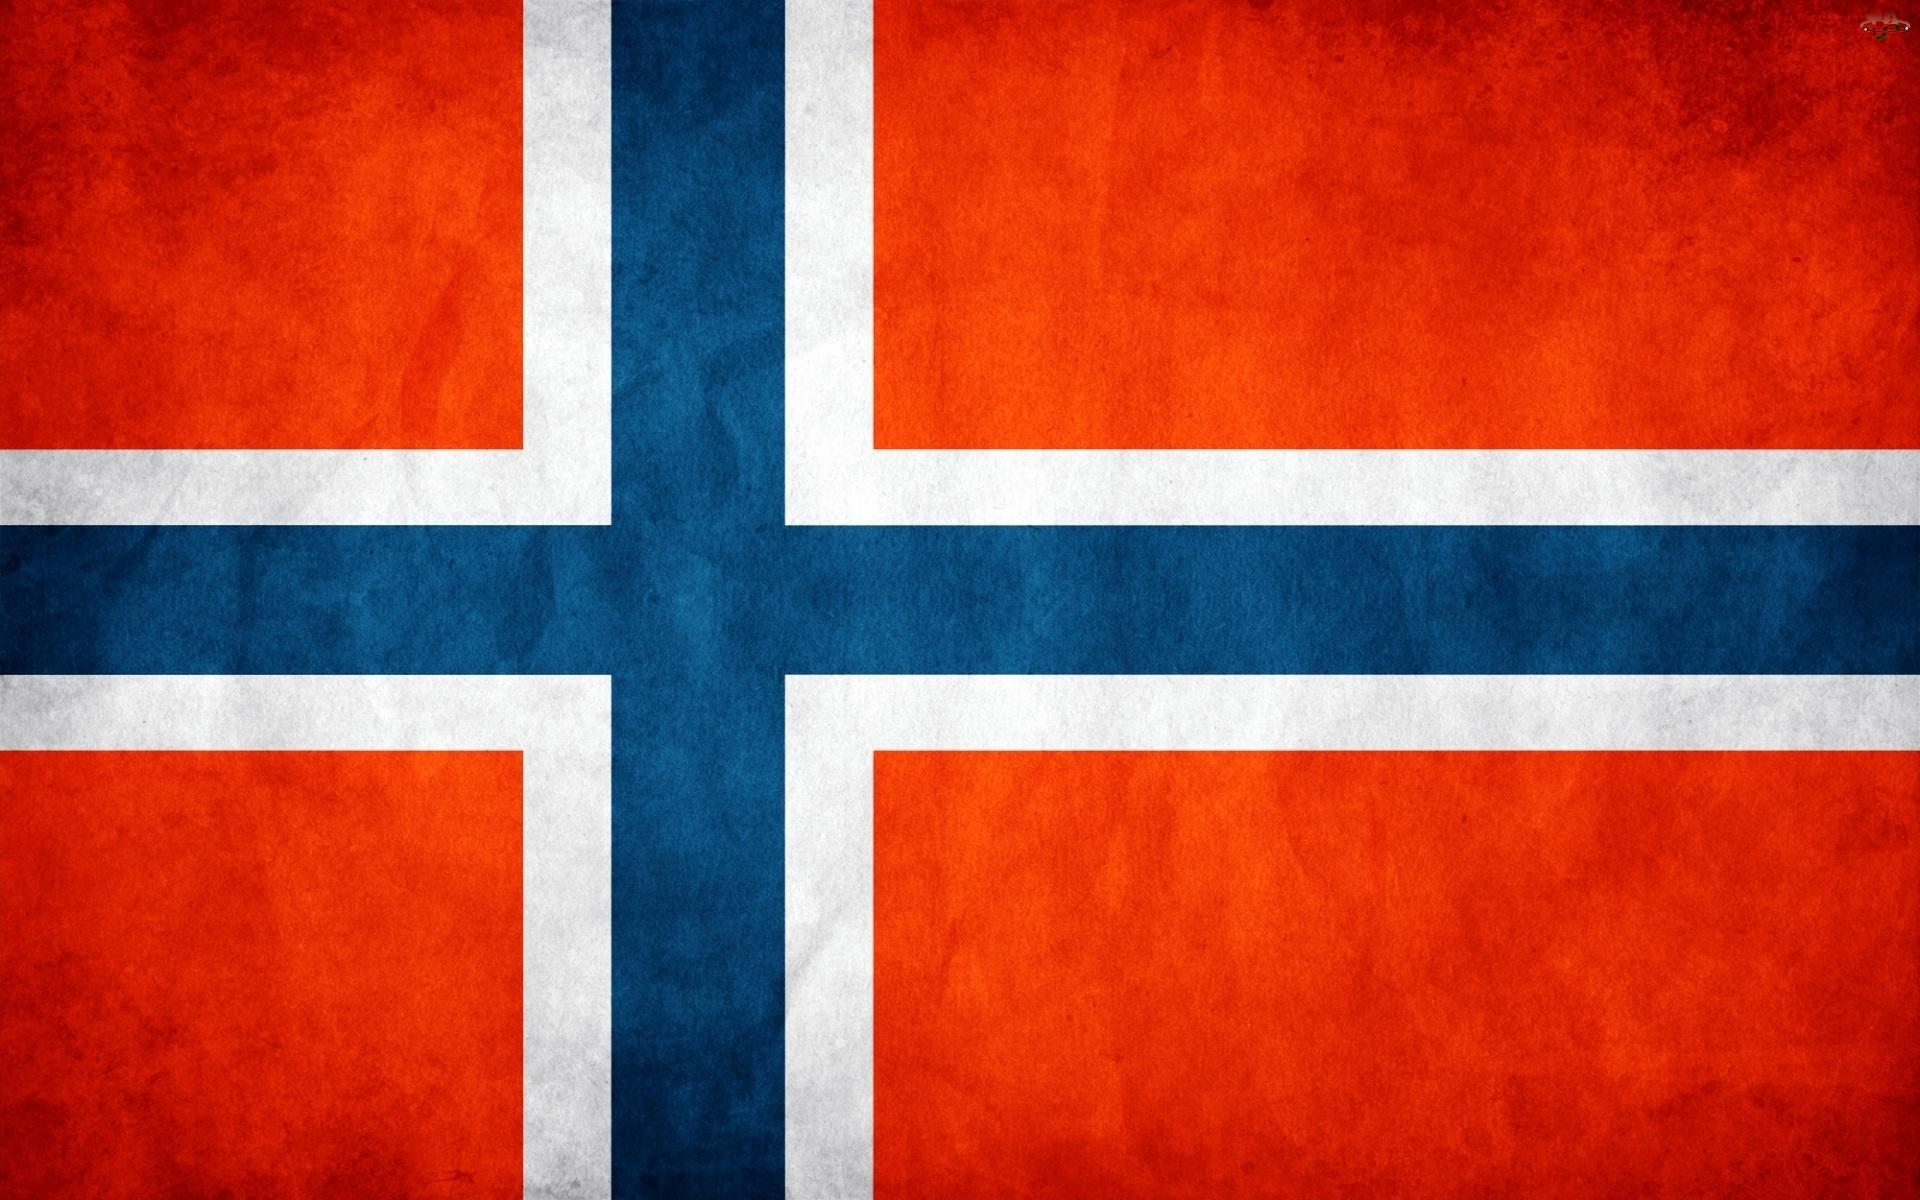 Norwegia, Flaga, Państwa